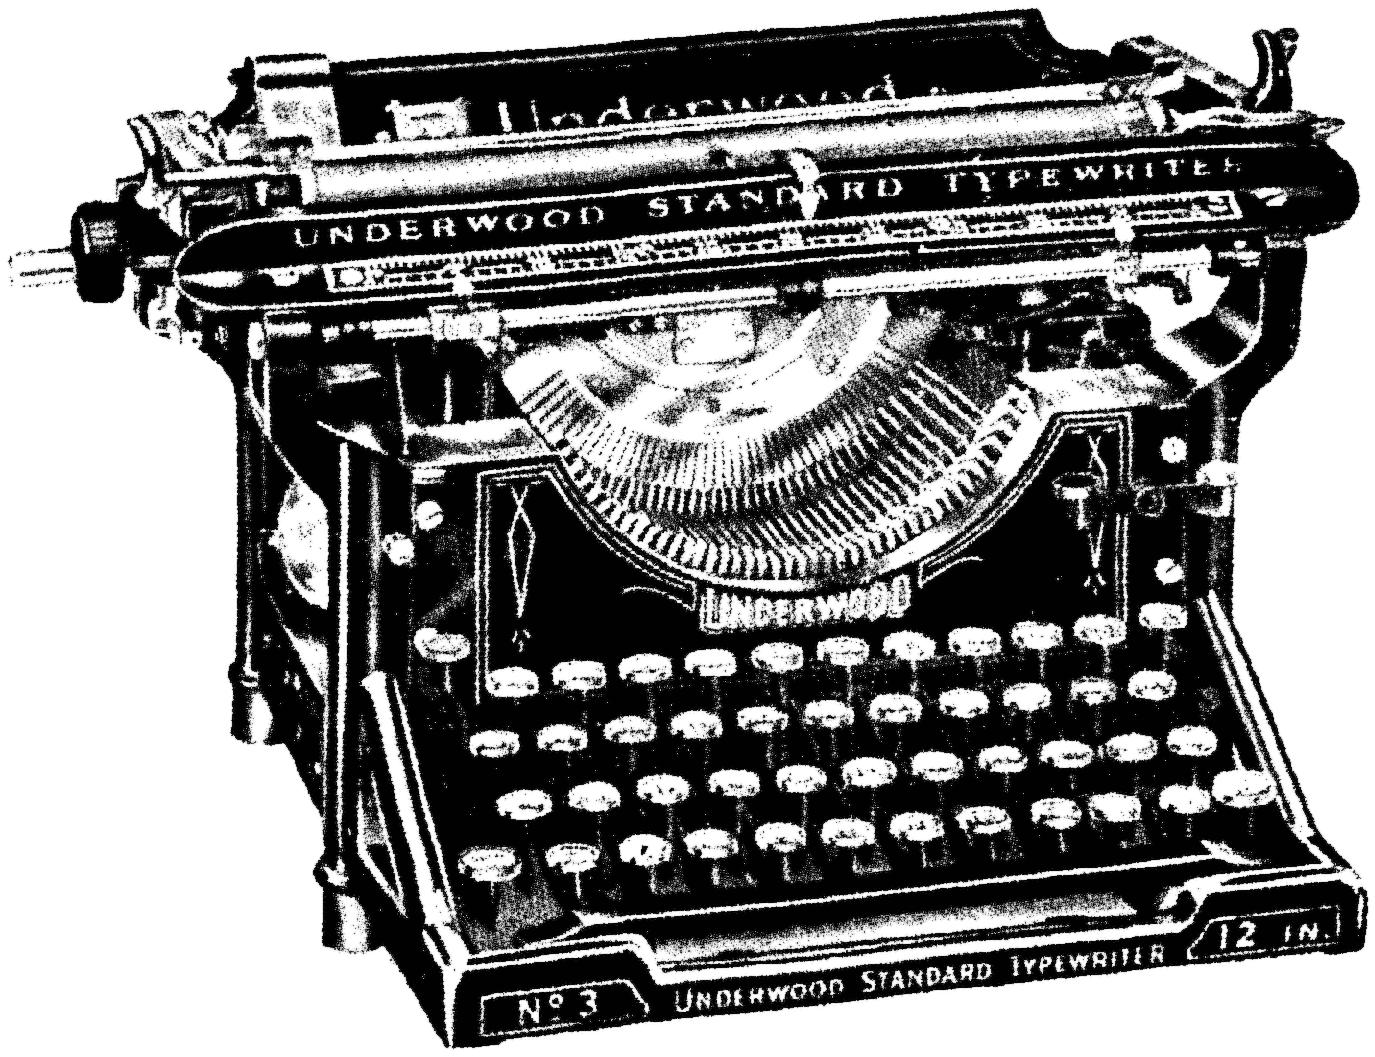 Underwood Mod. 3